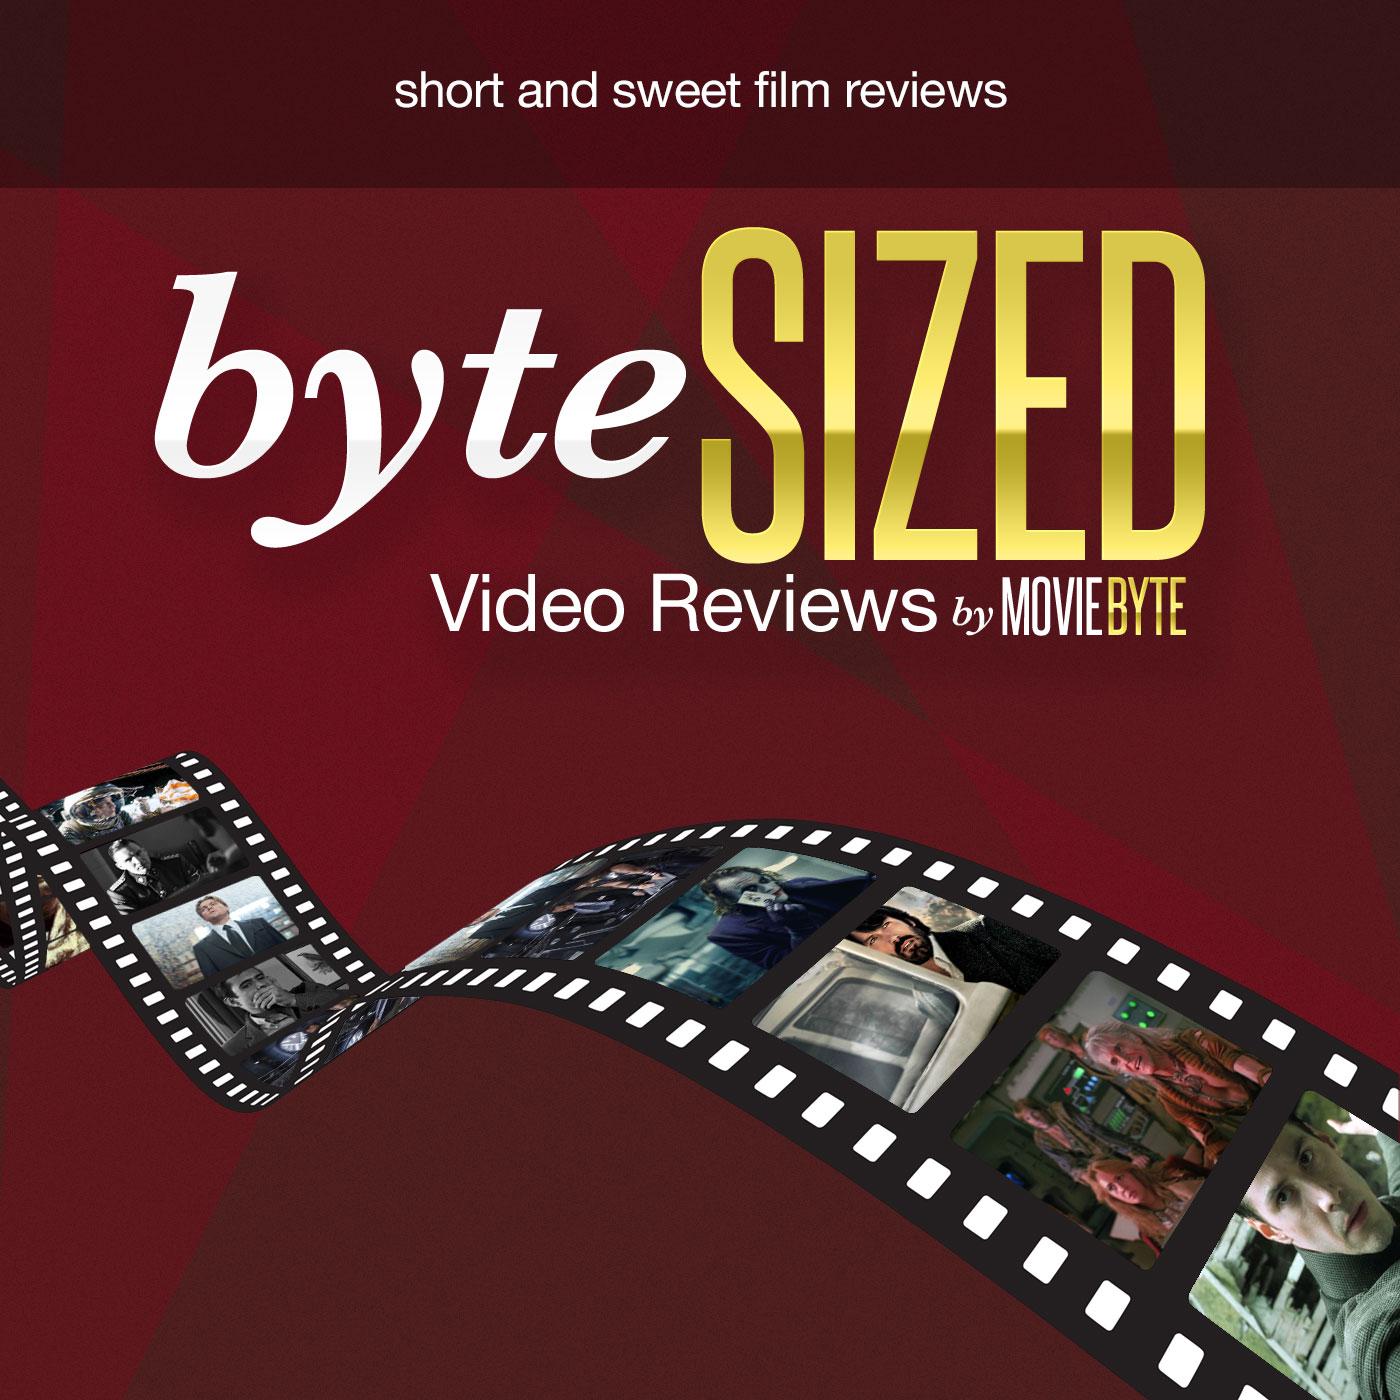 ByteSized Video Reviews